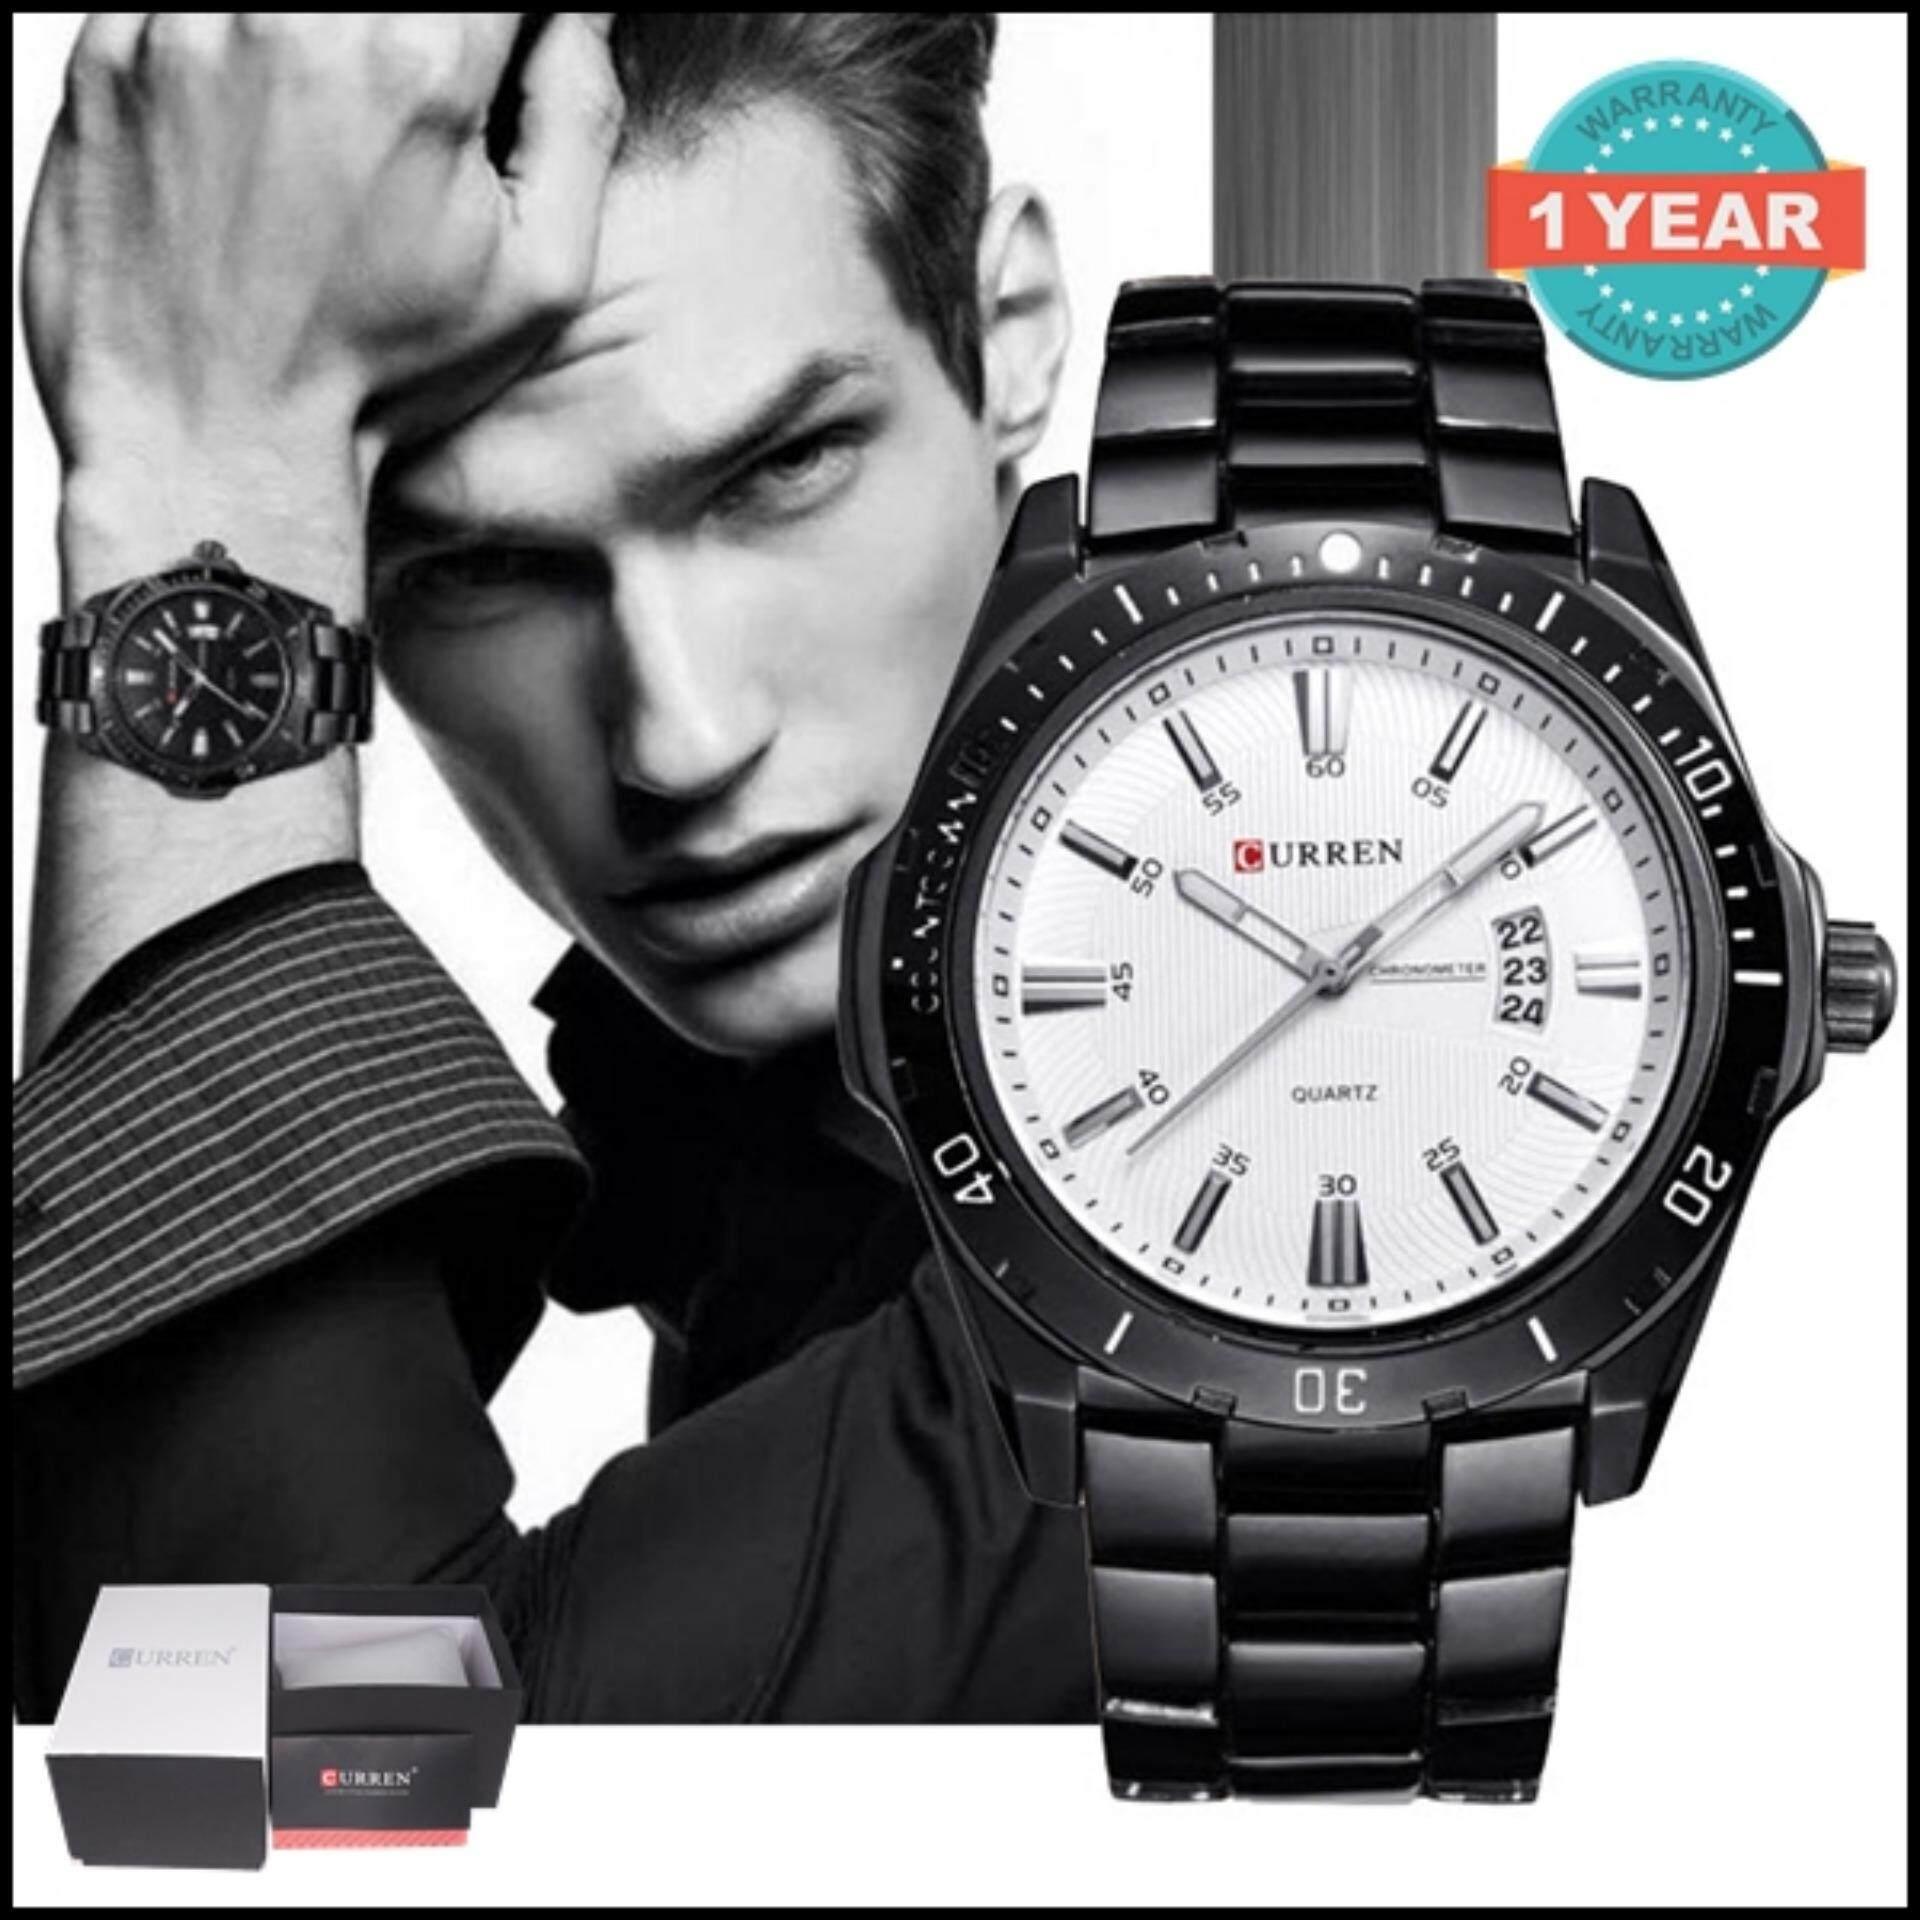 Curren นาฬิกาข้อมือสุภาพบุรุษ Black White สายสแตนเลส รุ่น C8110 เป็นต้นฉบับ